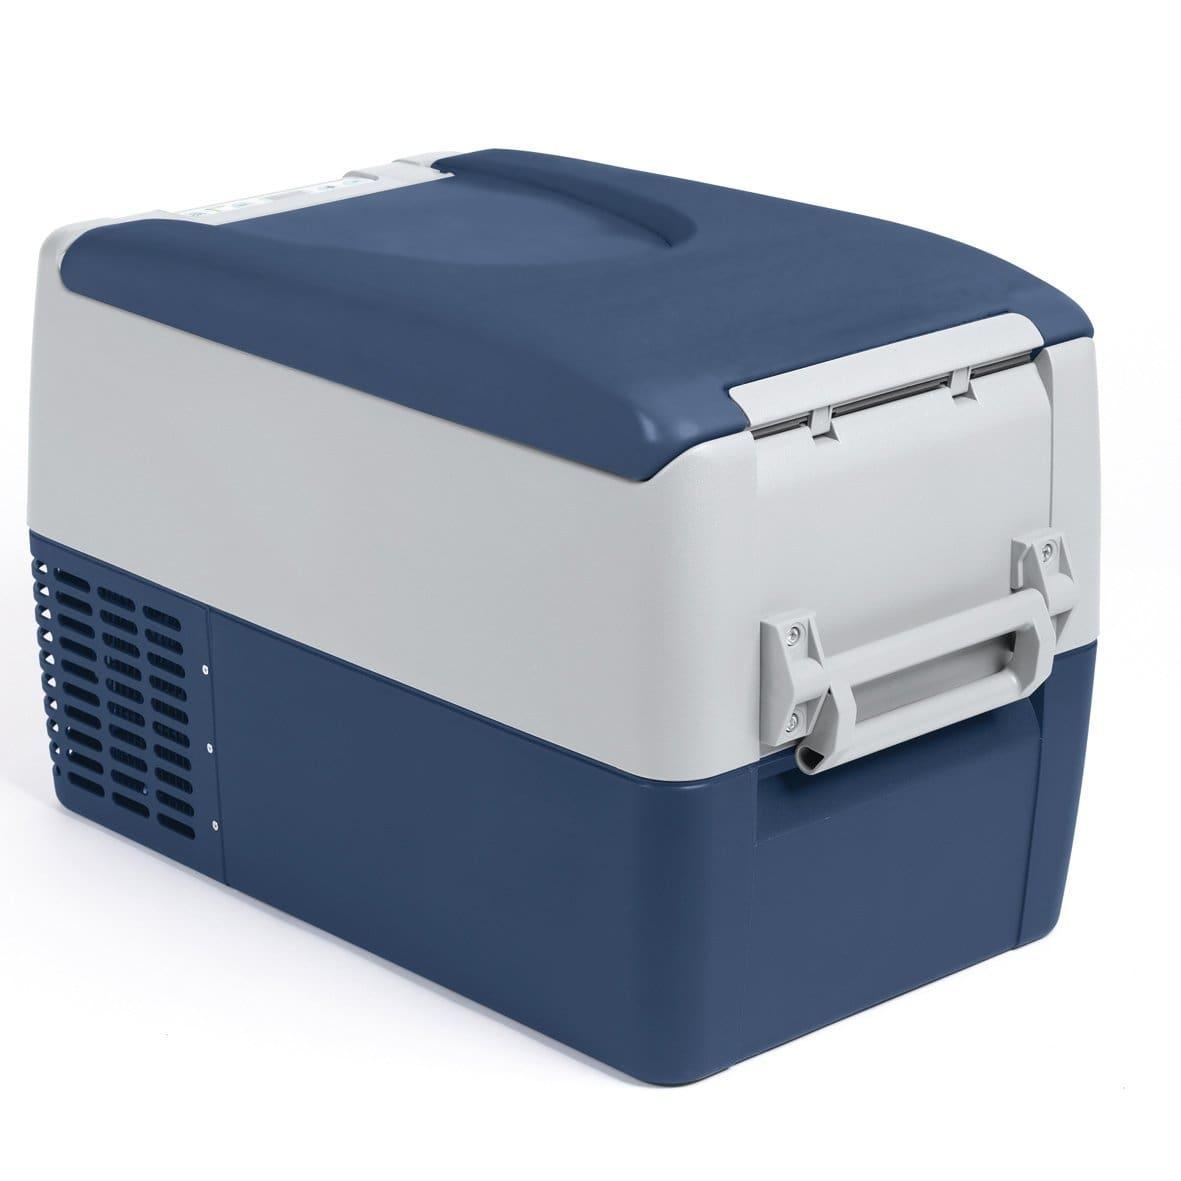 WAECO FR35 AC/DC Kompressorkühlbox 34l A++ für 499,00 Euro